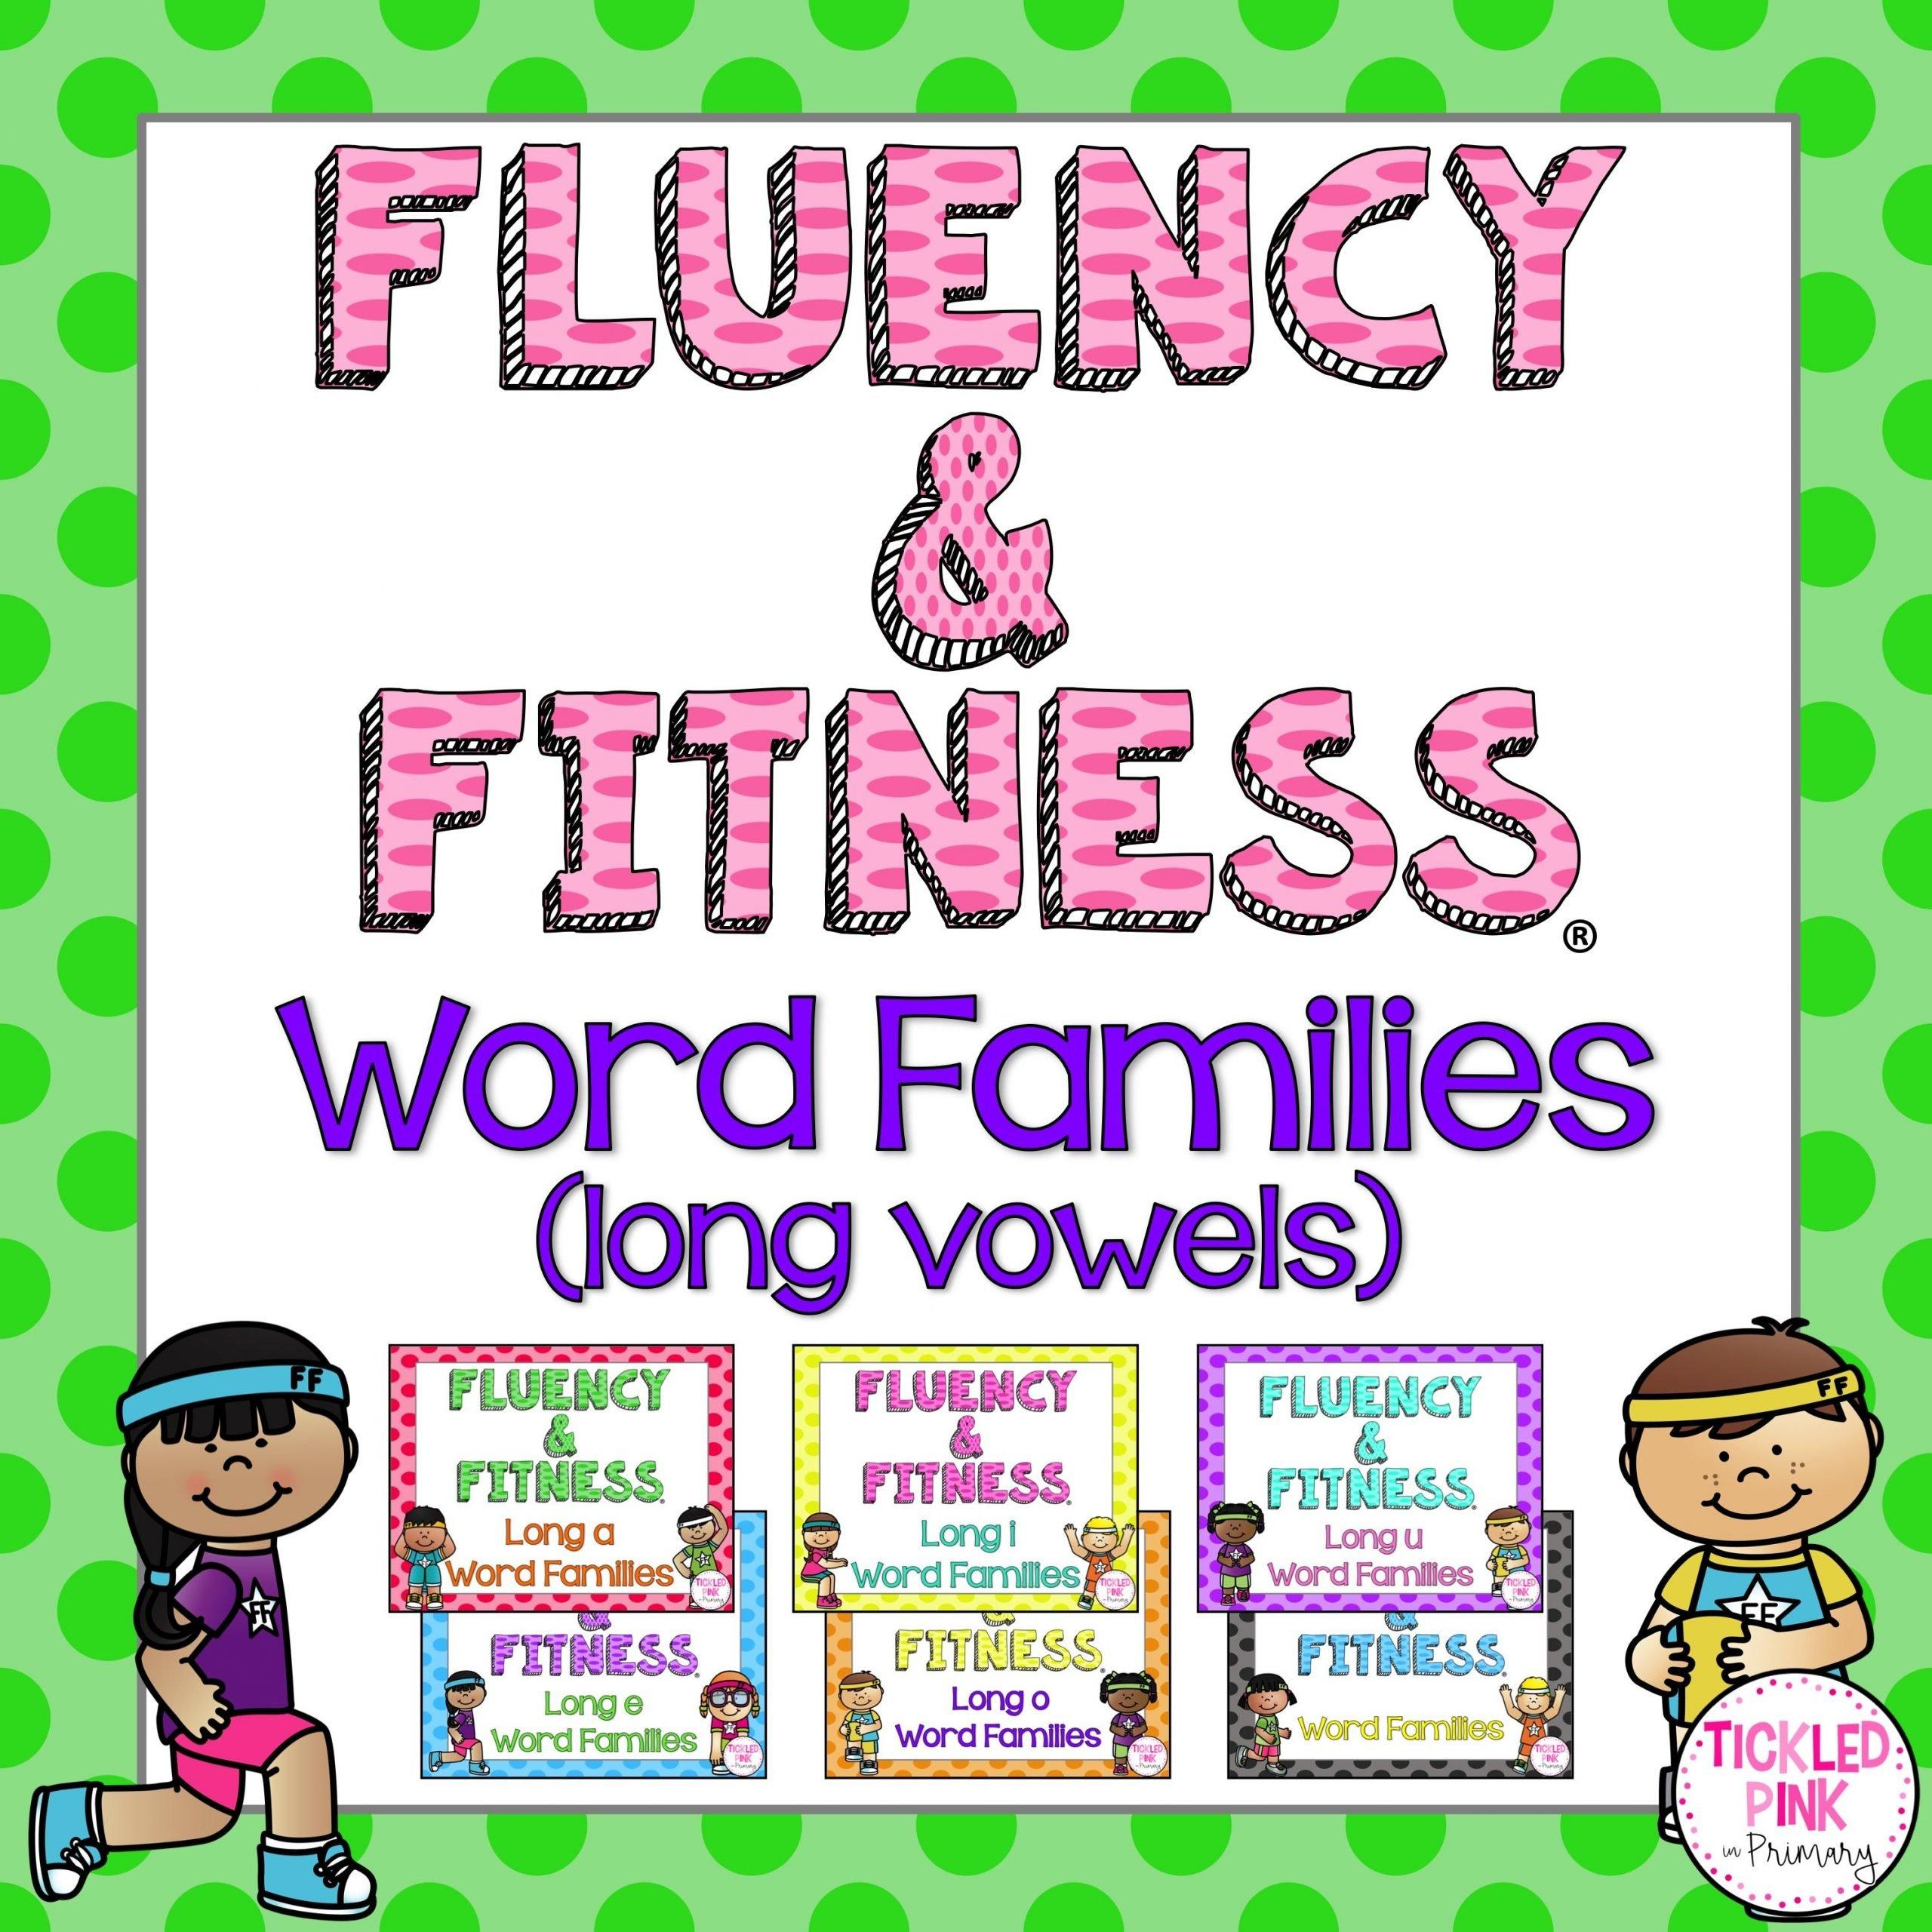 Word Families Long Vowels Fluency Fitness Brain Breaks Tickled Pink In Primary